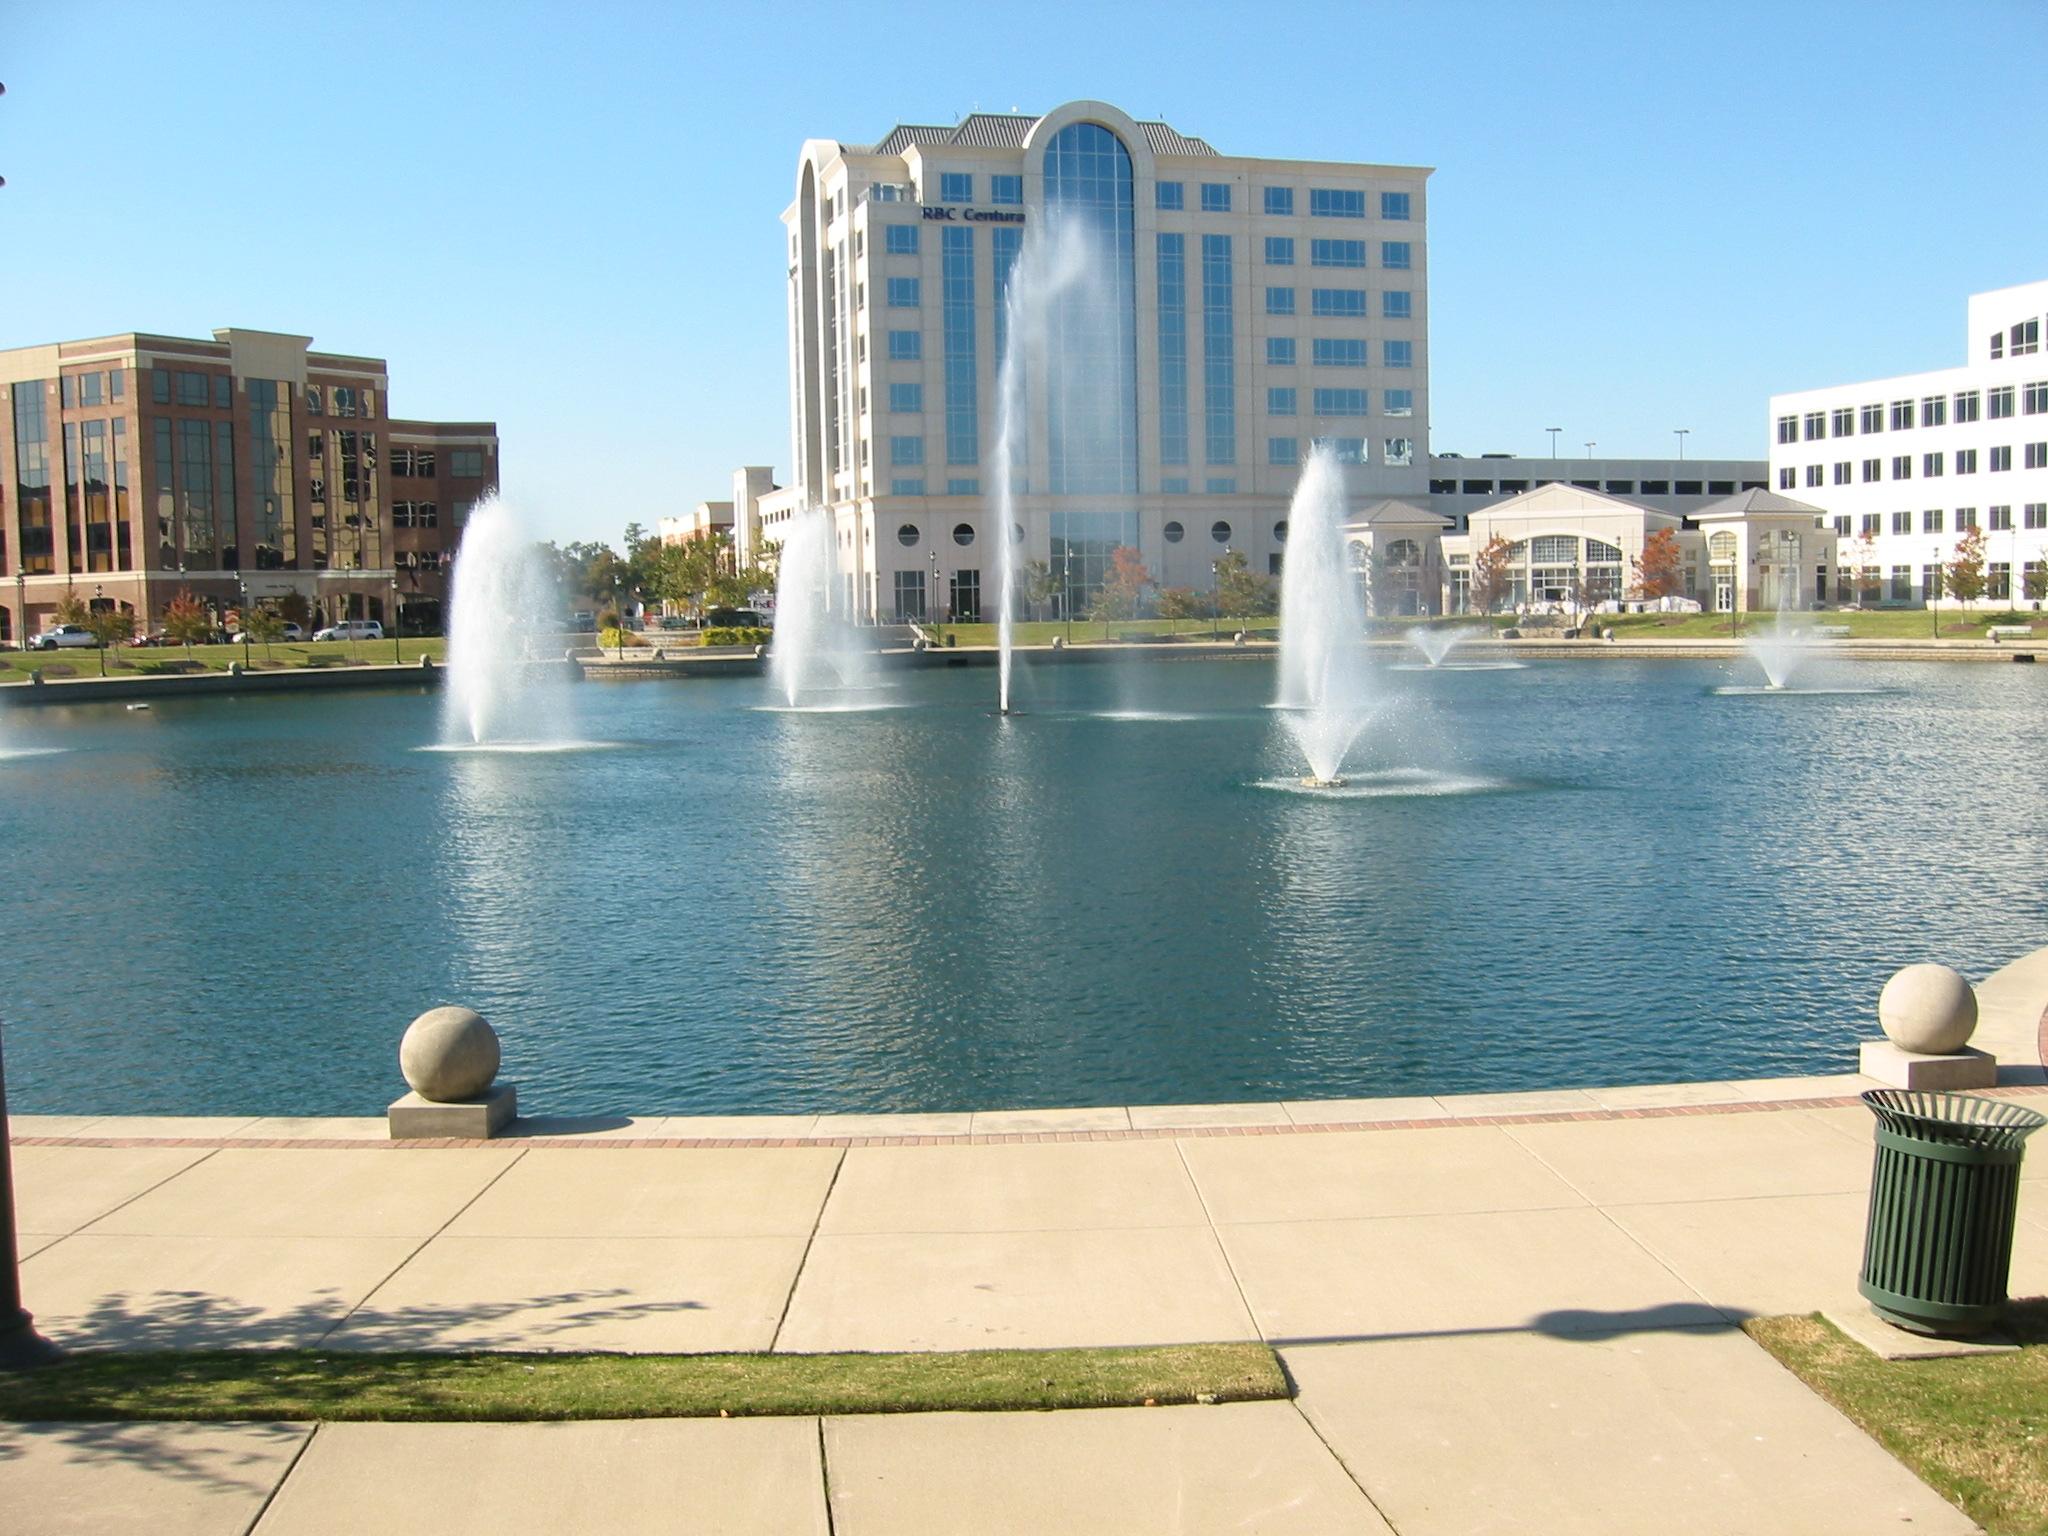 Fountain Installation 1 Ring Road 01